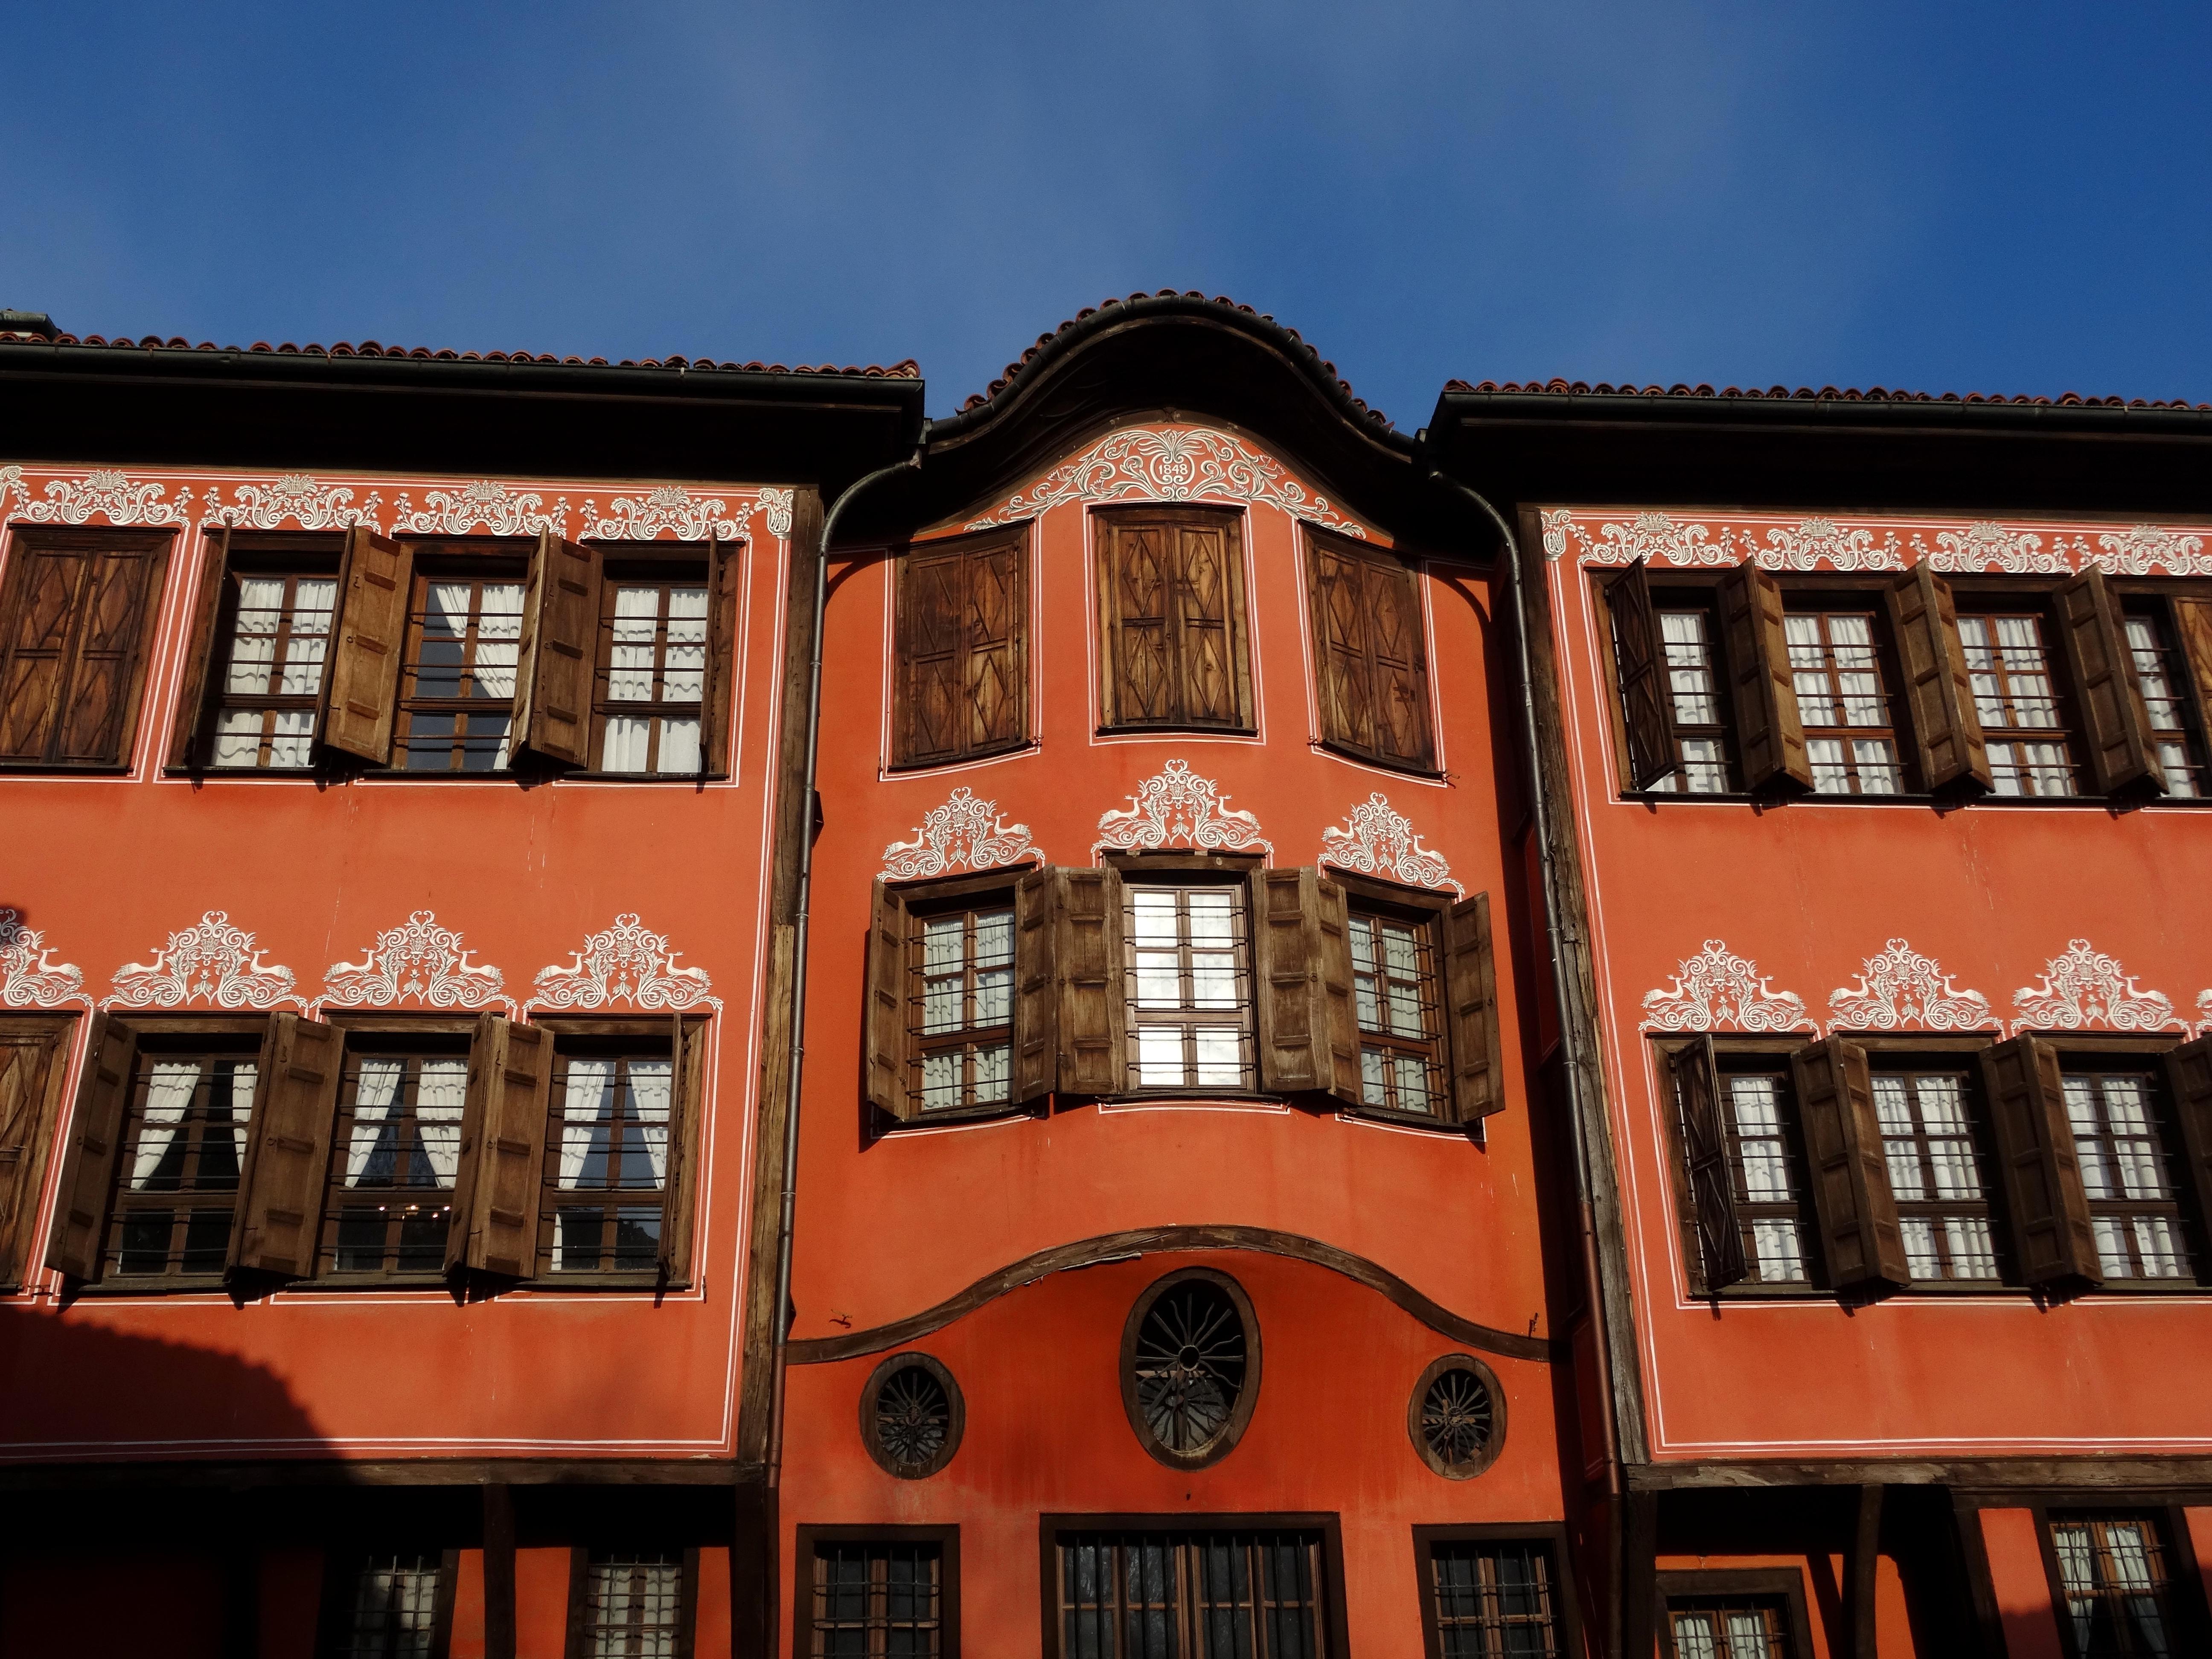 plovdiv oldest city world